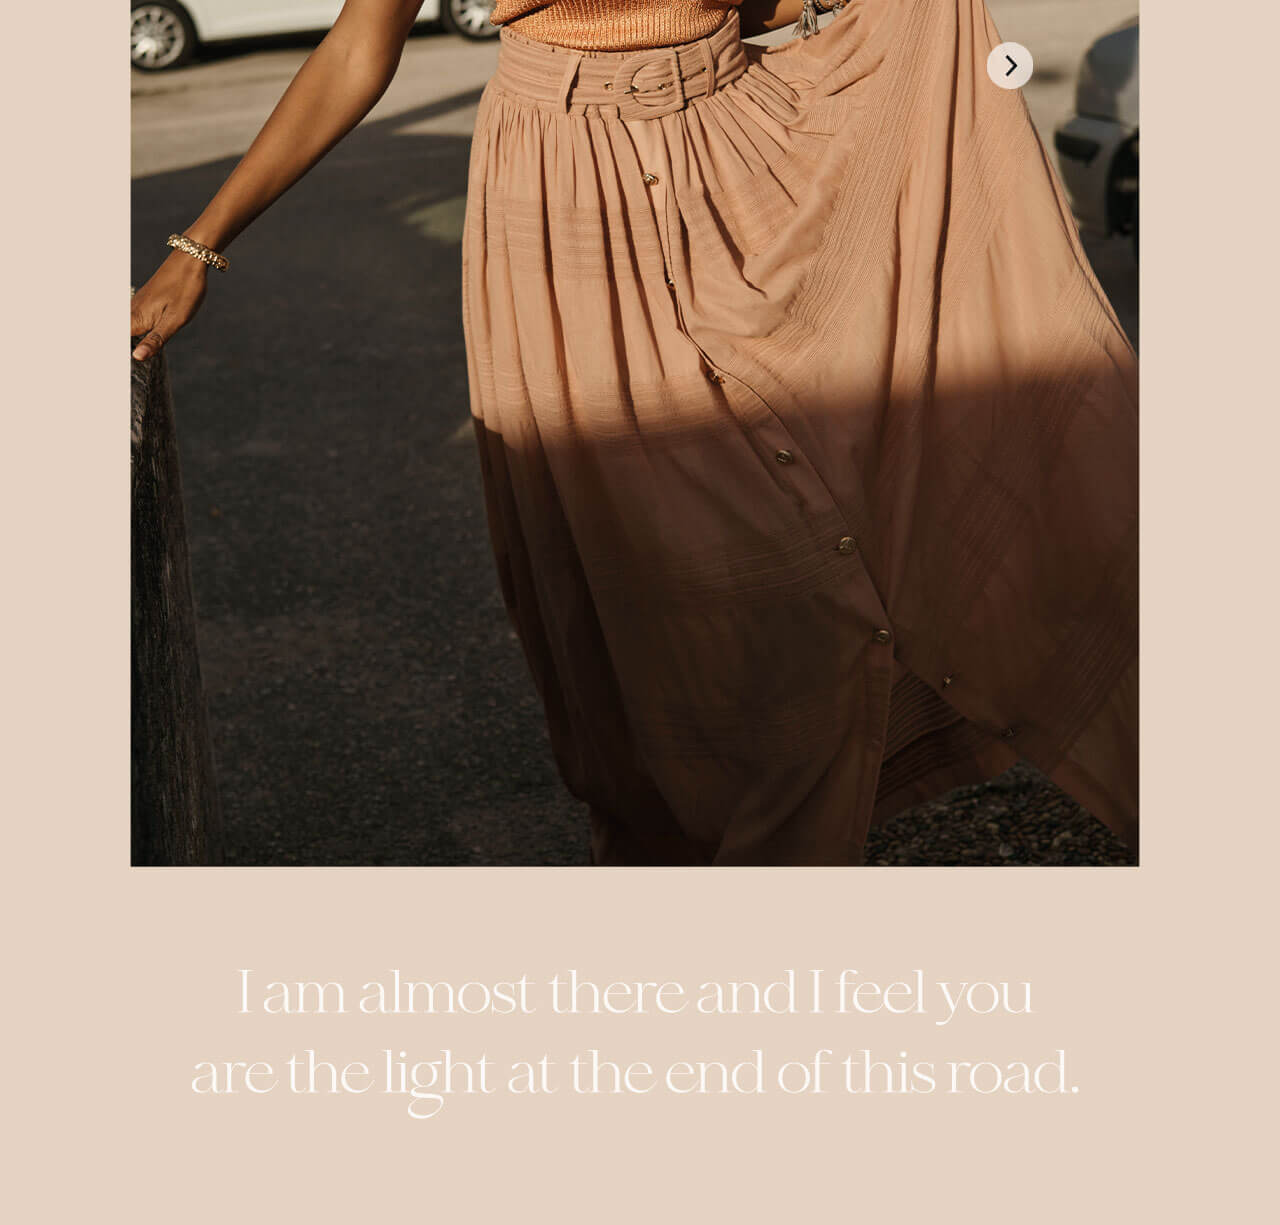 JOSH V Summer '21 - Almost time -Verona skirt summer skin